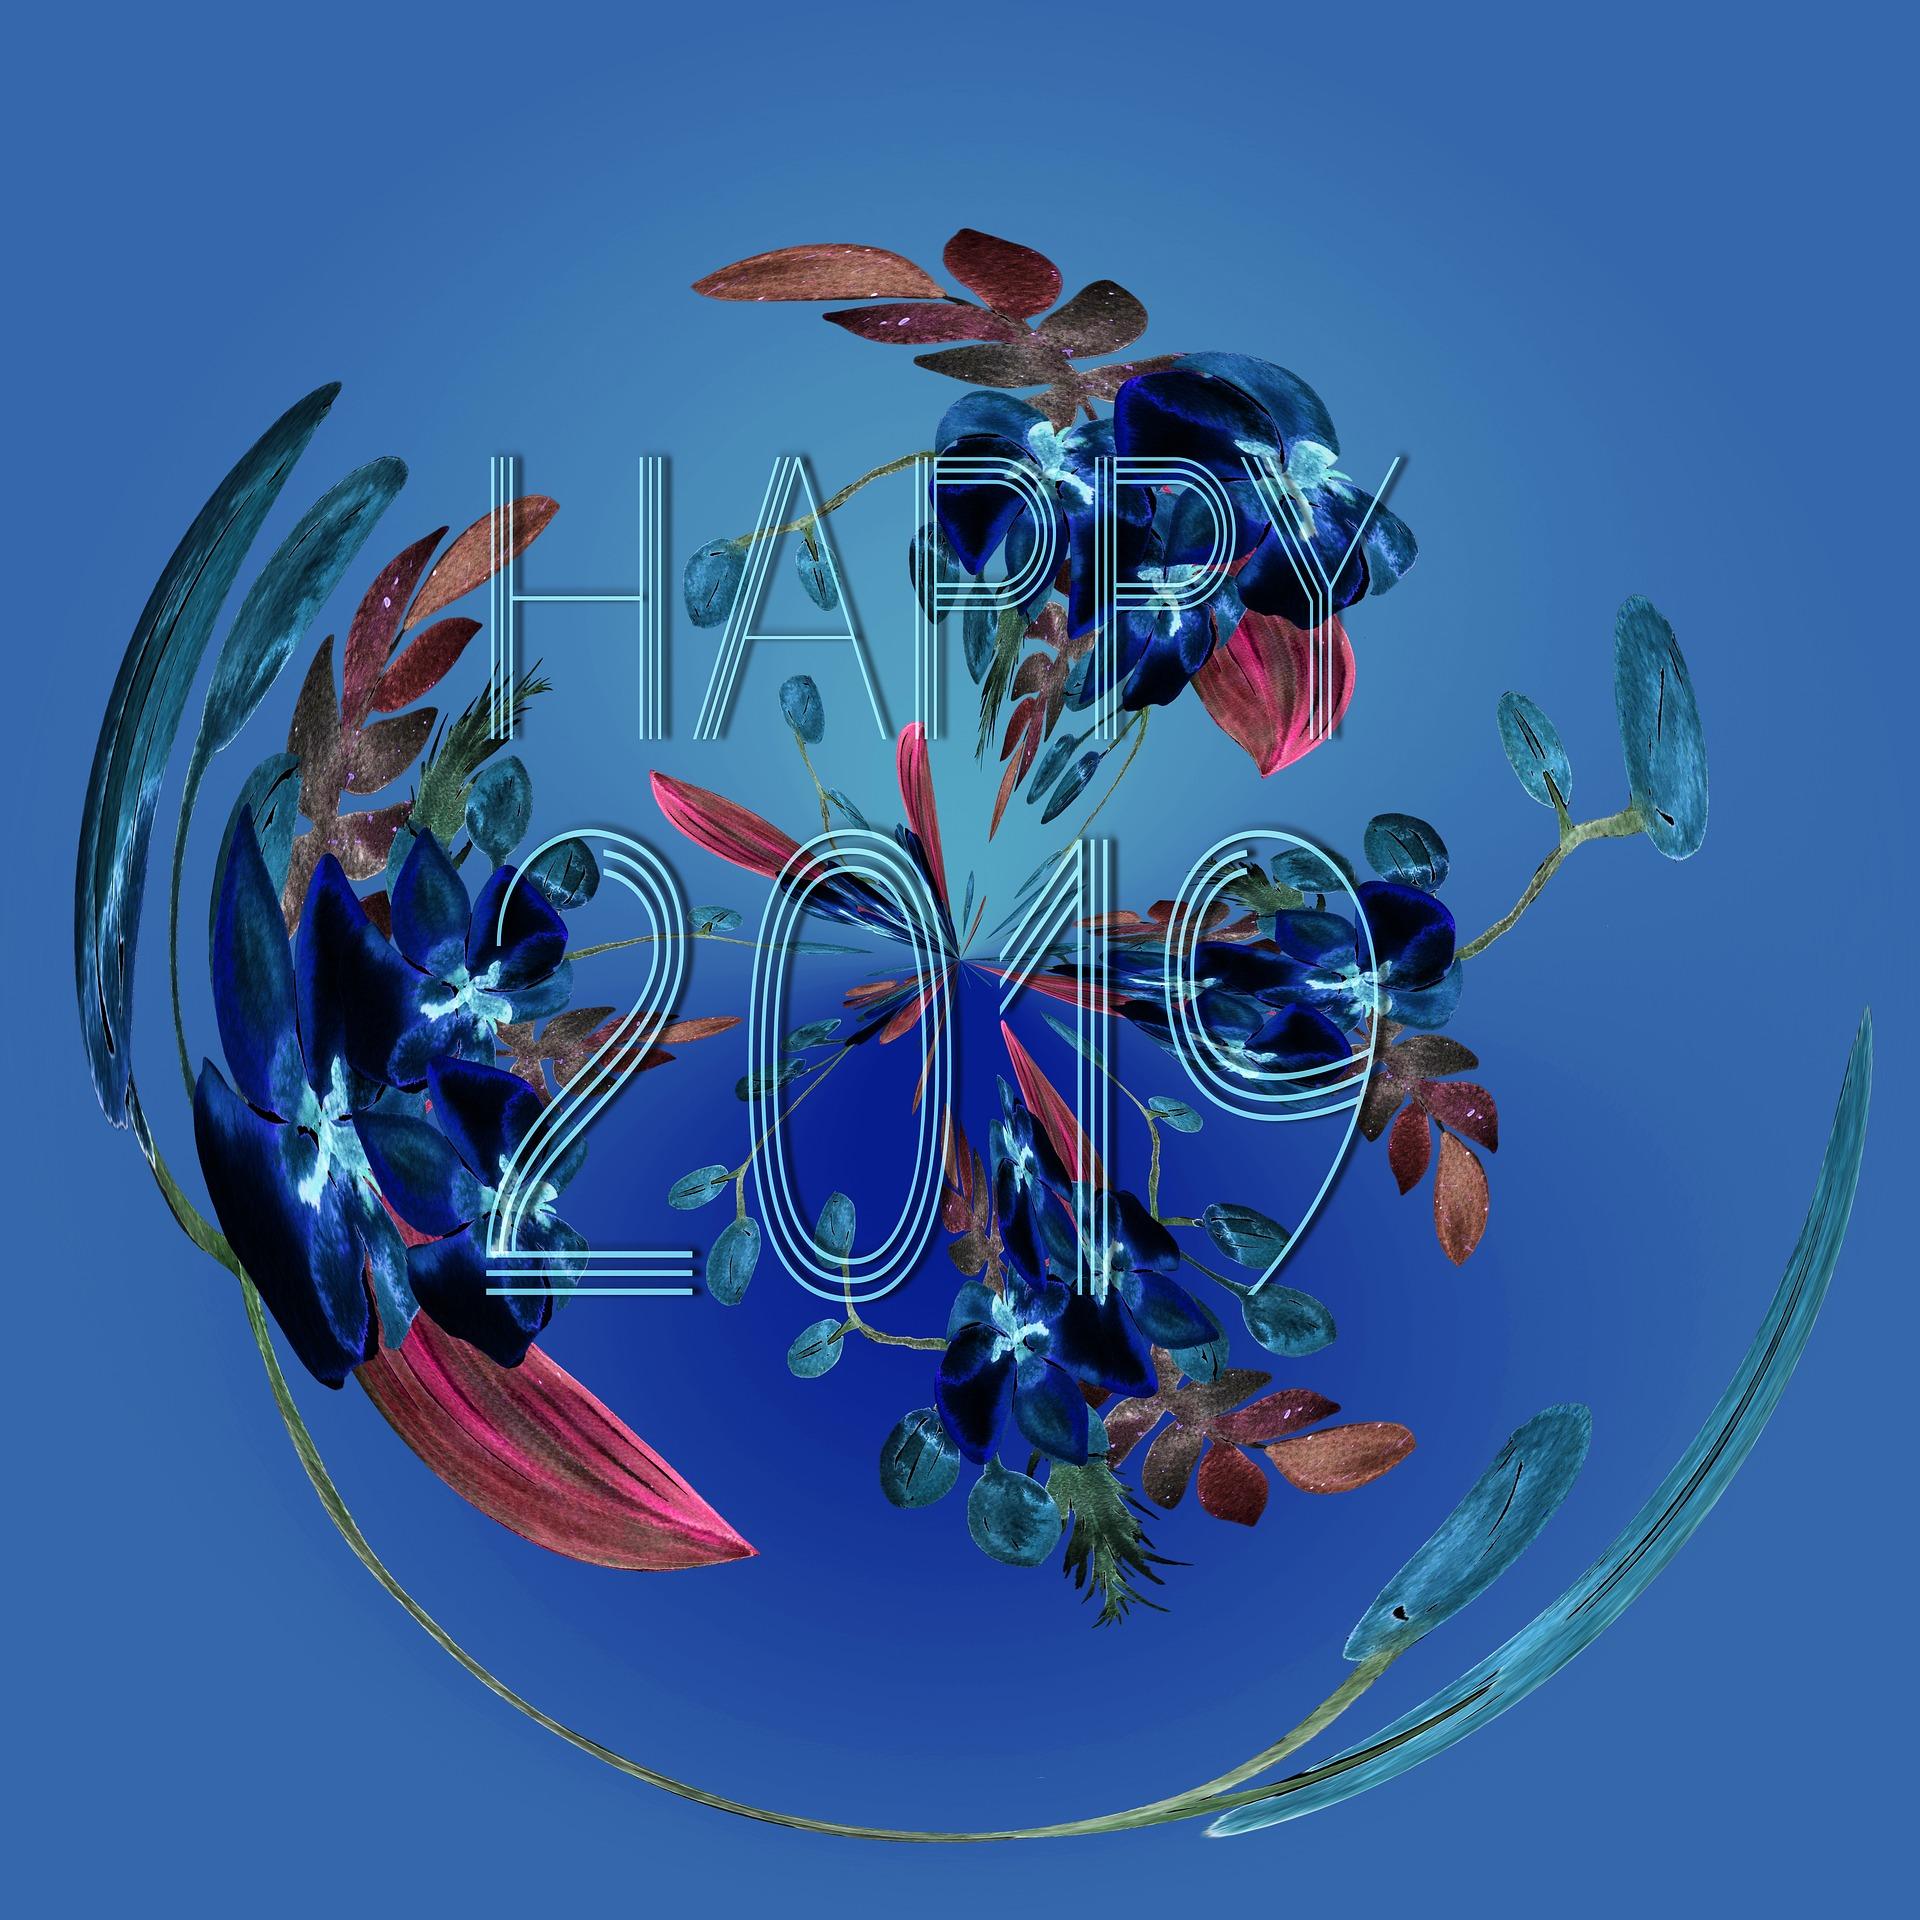 Happy 2019 - Free image by Pixabay.com